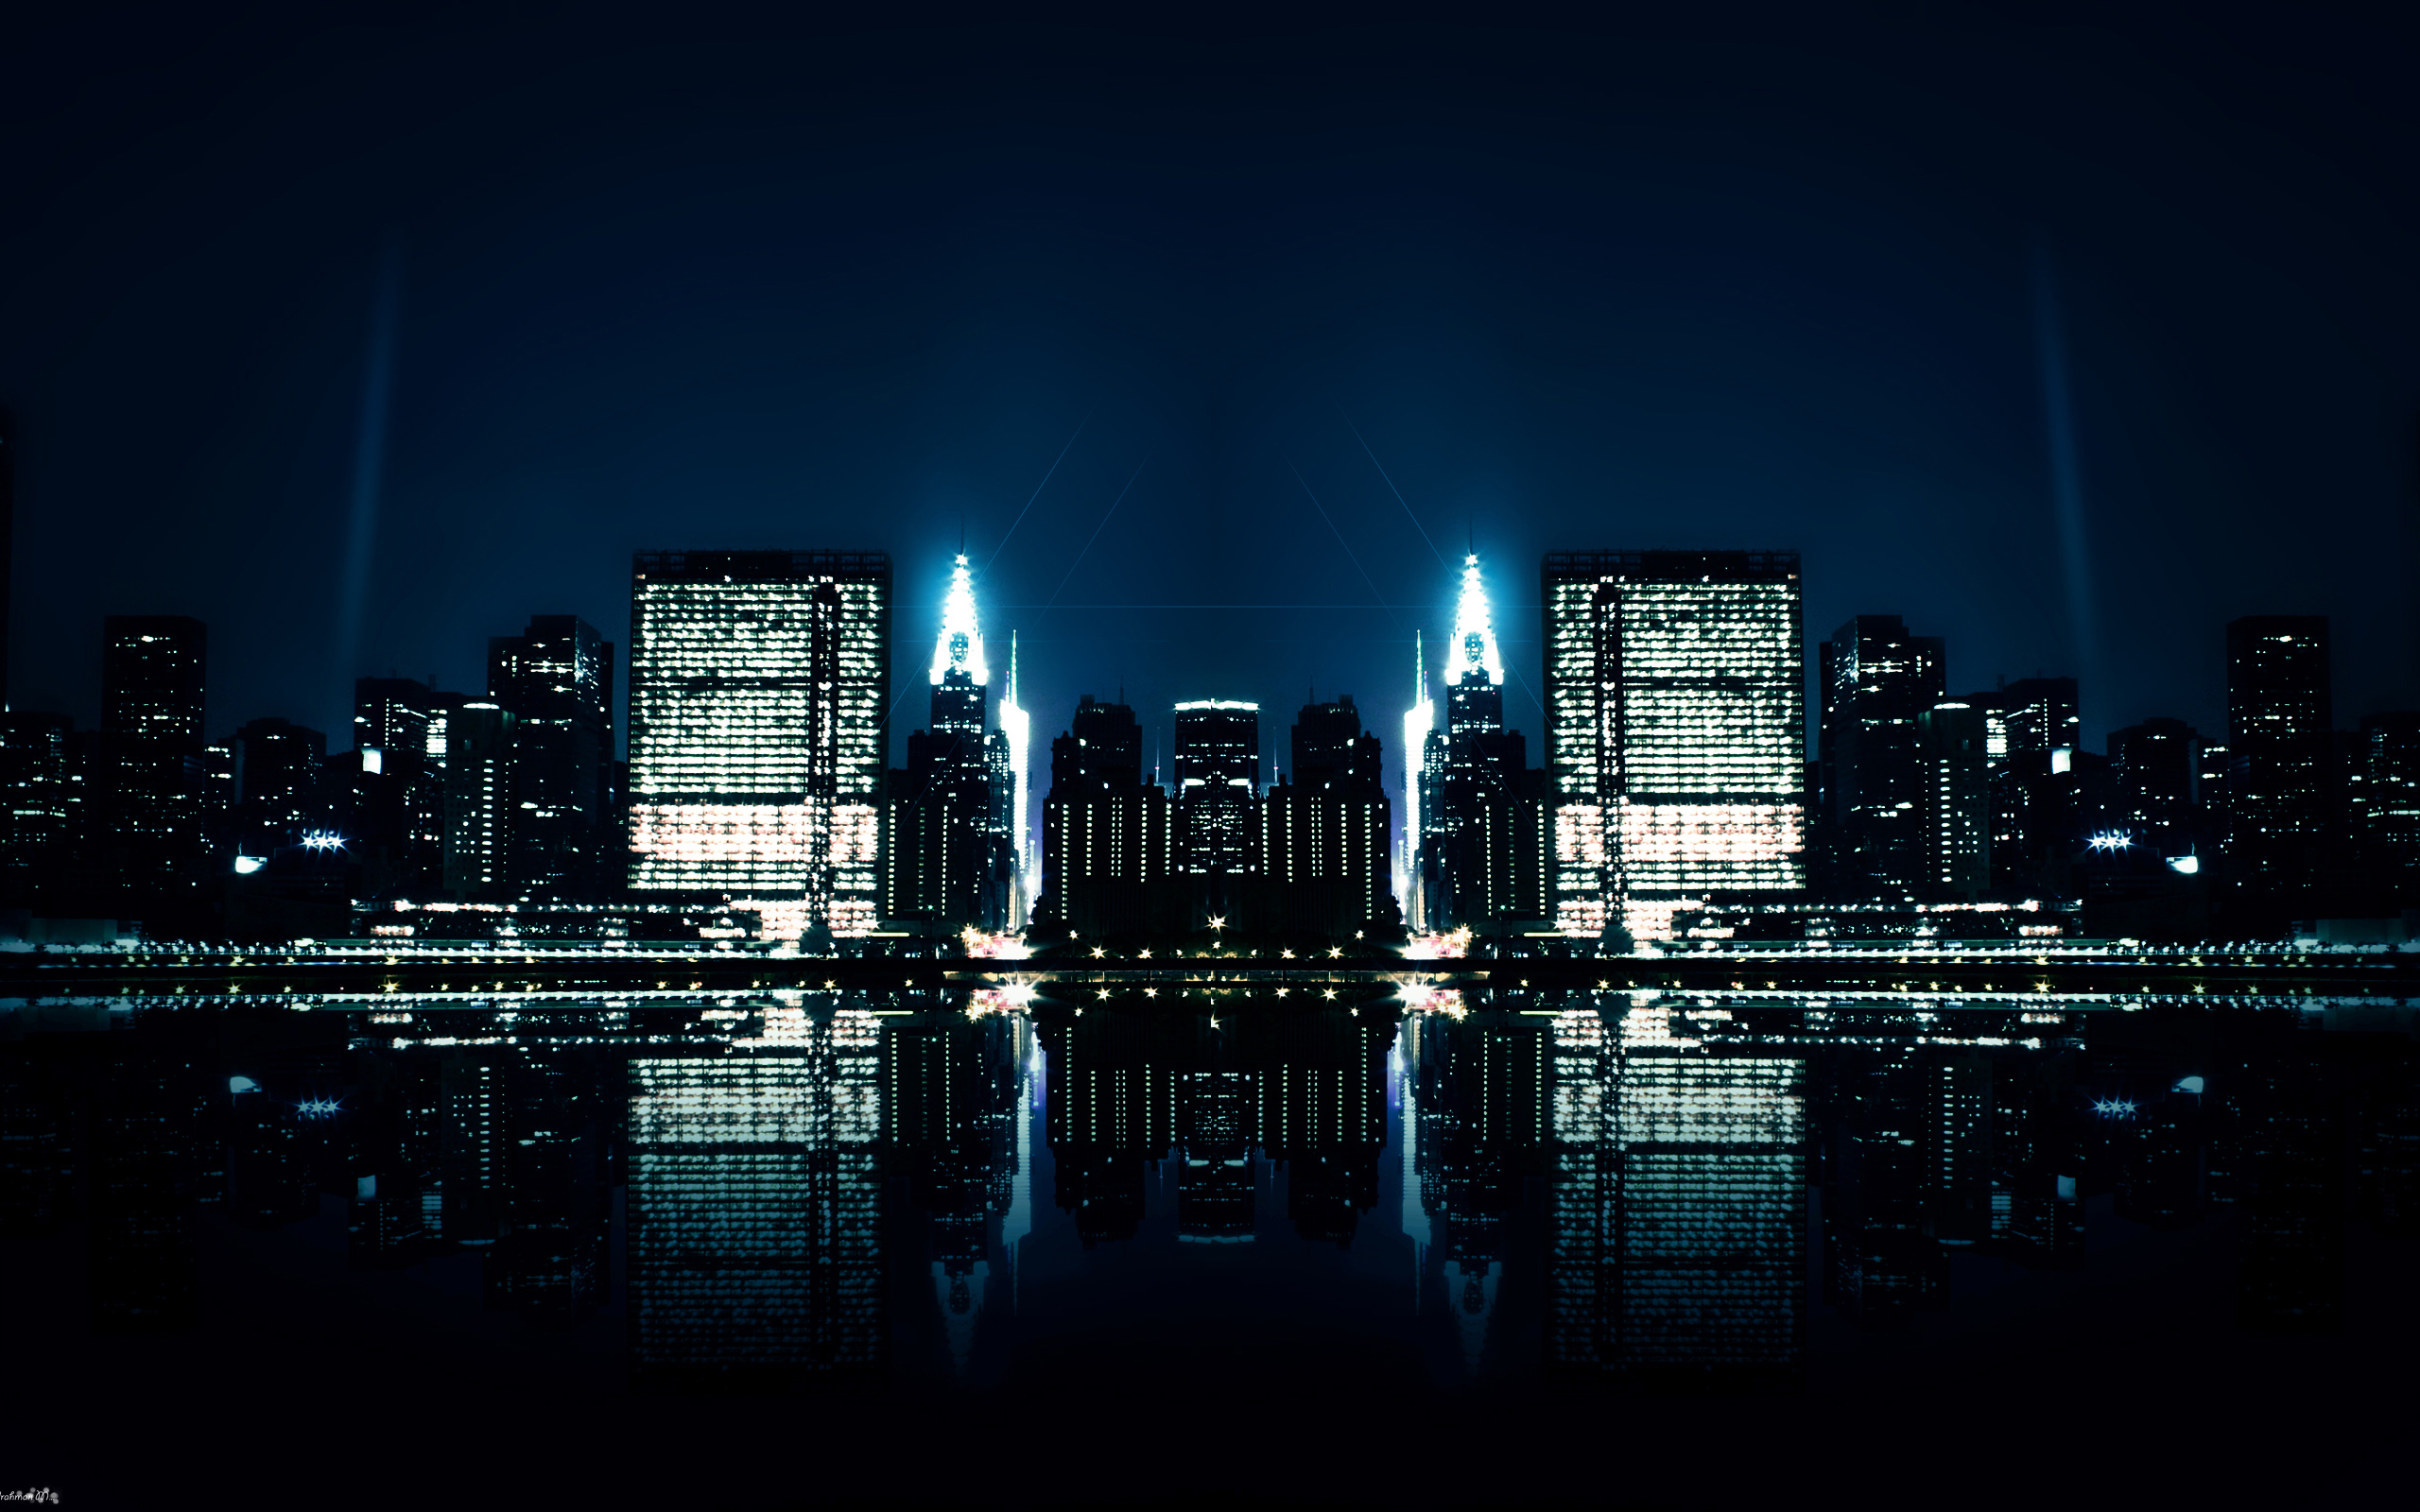 City Night Reflections wallpaper